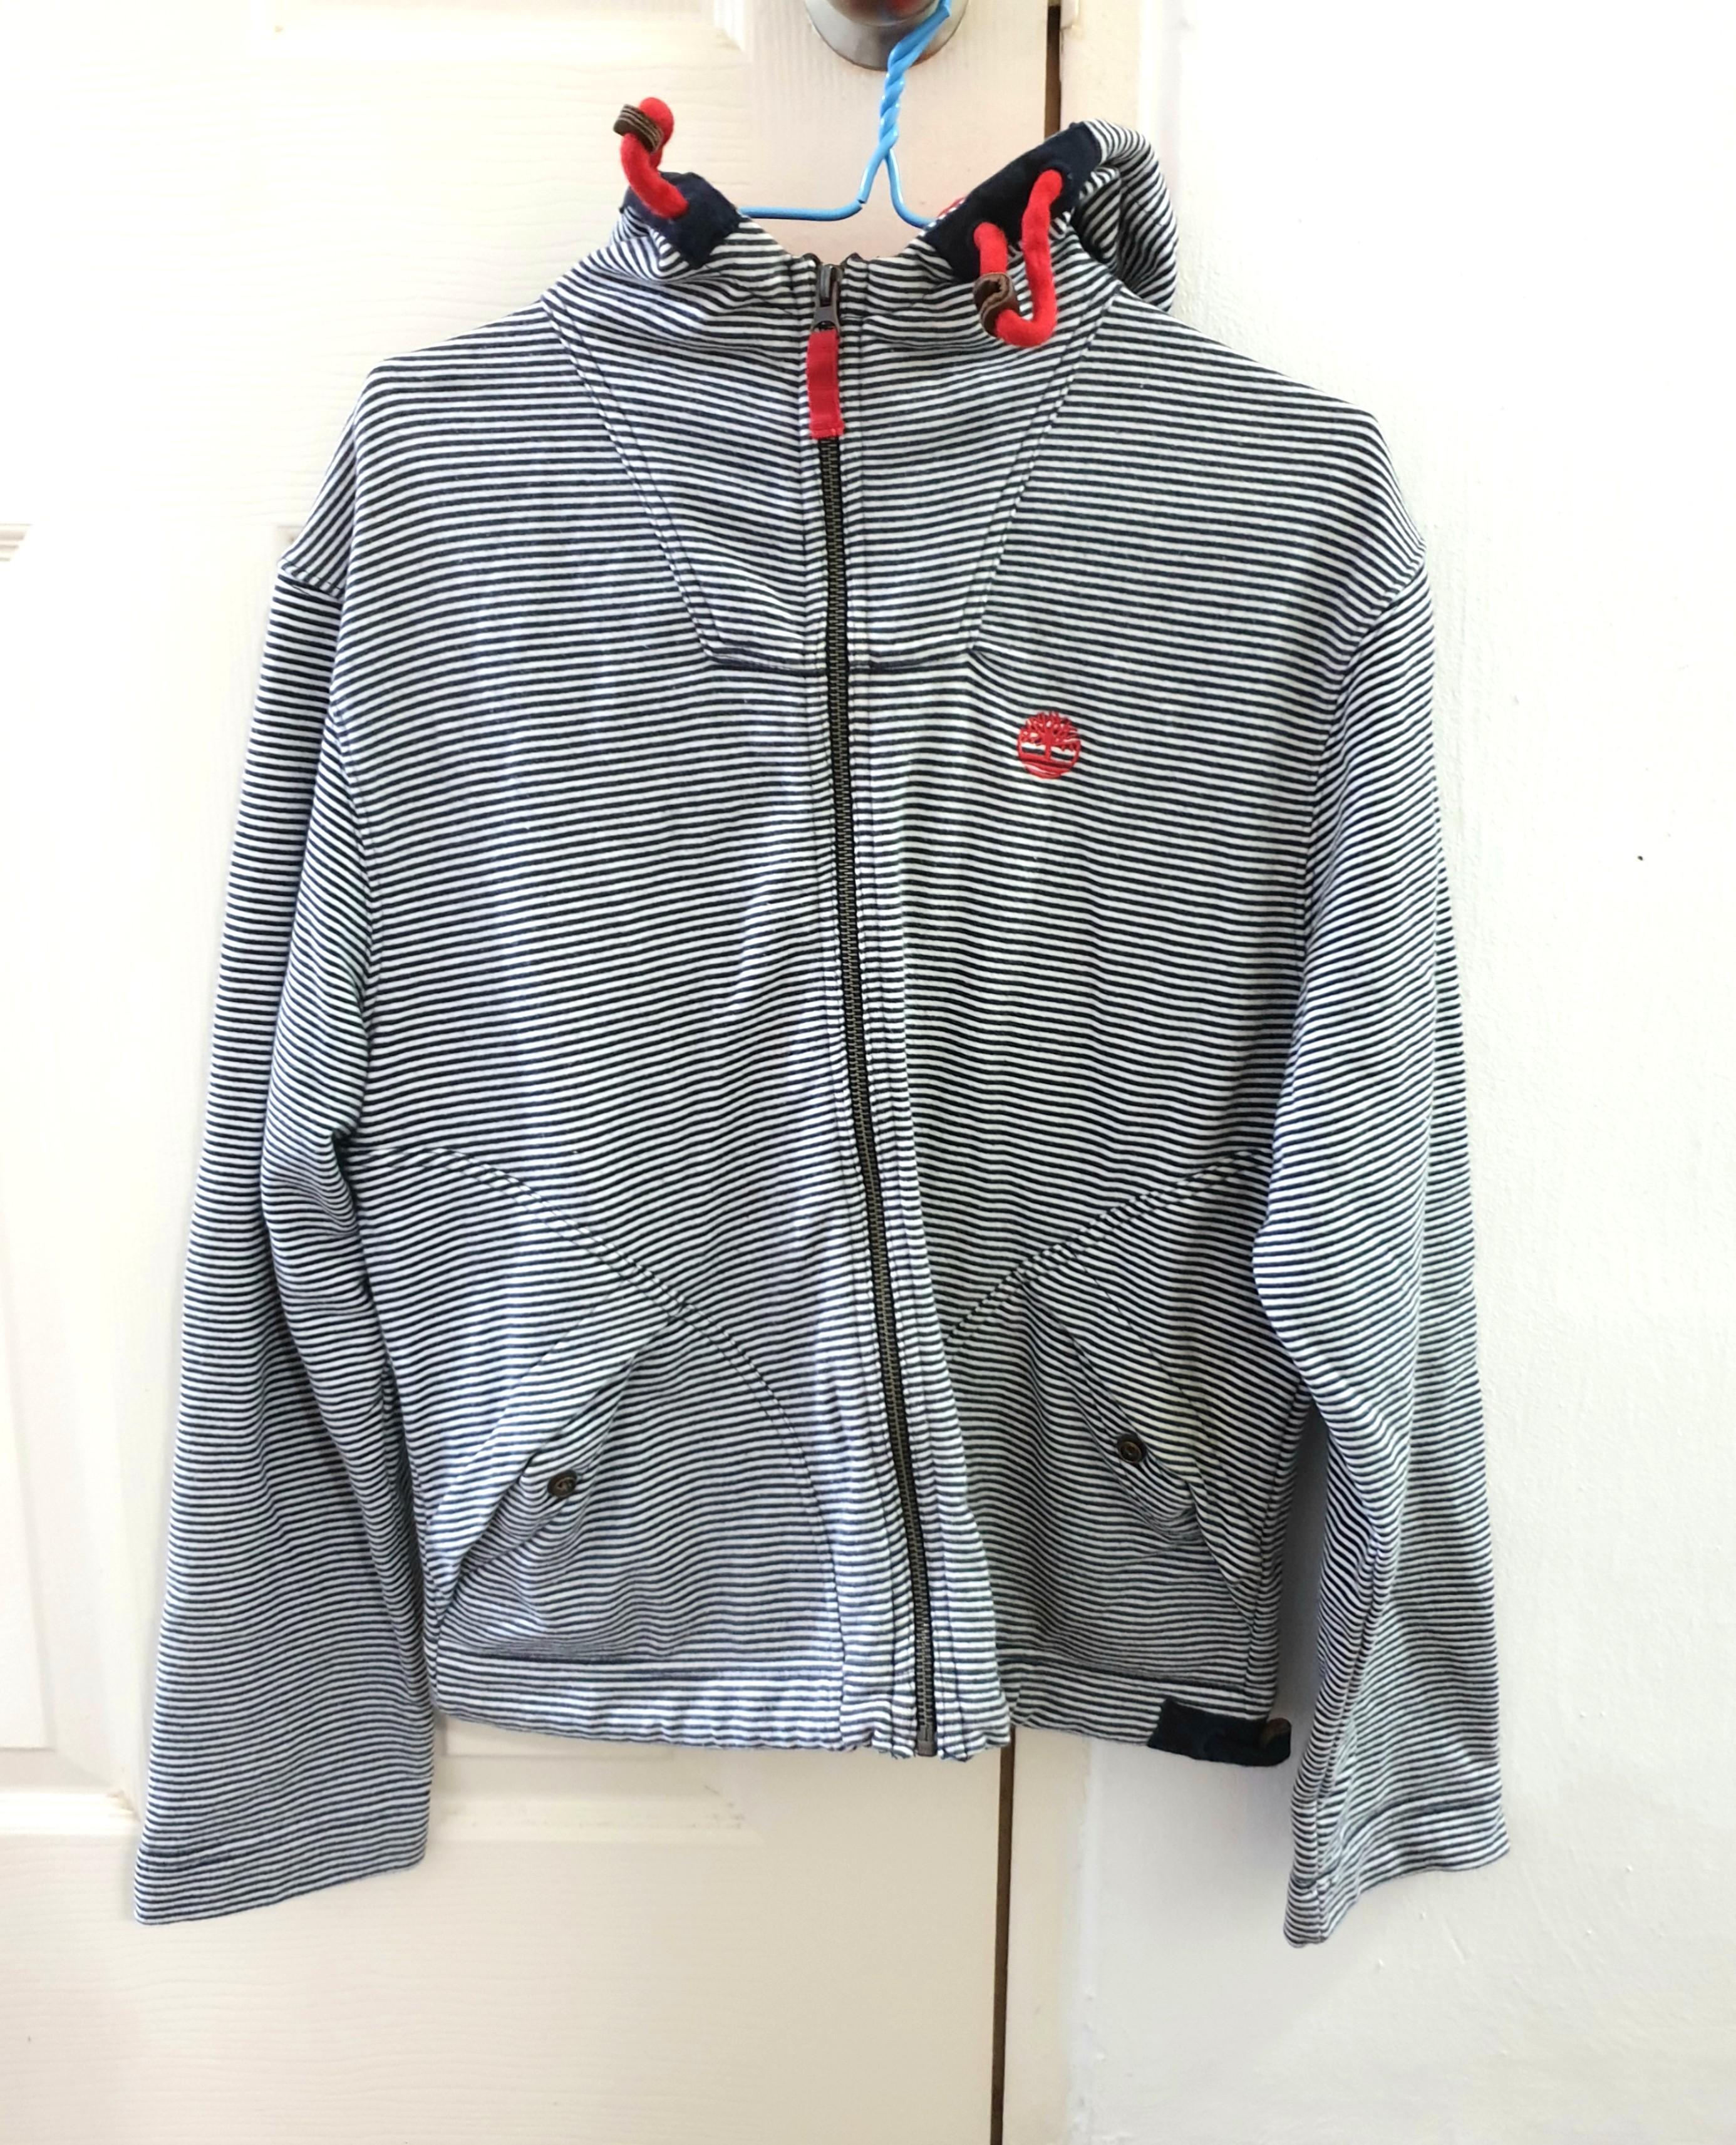 Timberland Navy Stripe Jacket